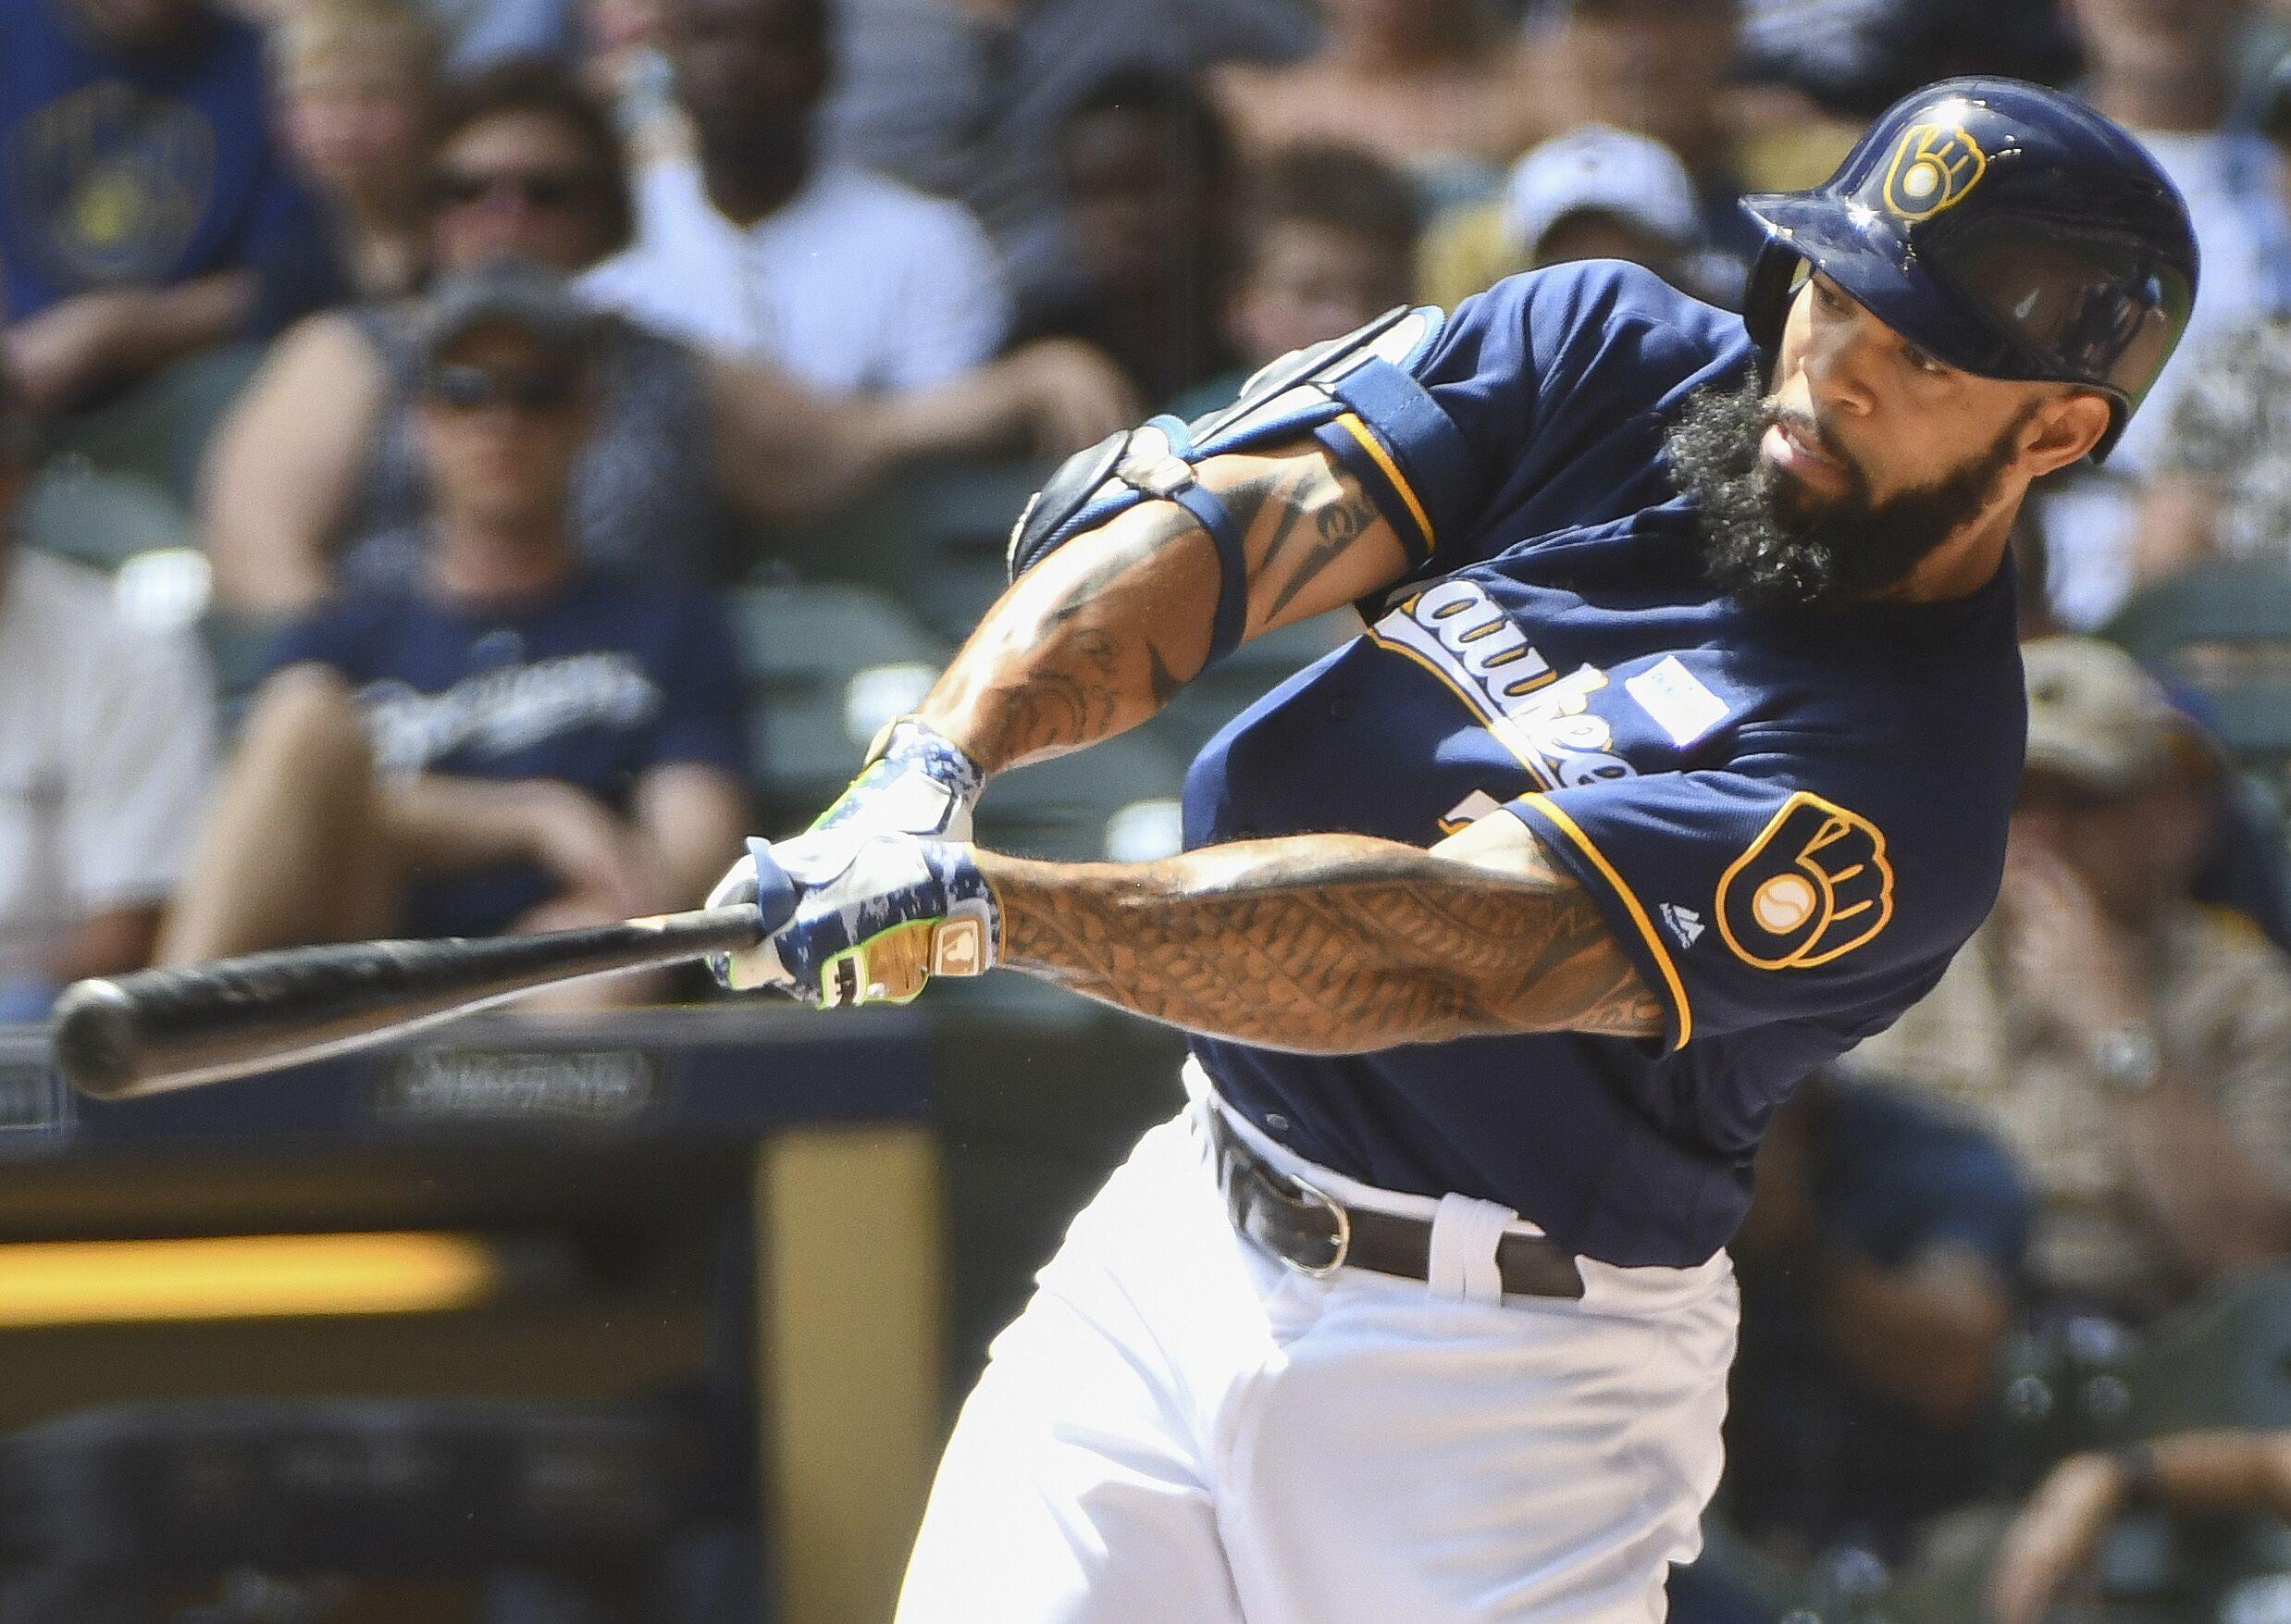 Milwaukee Brewers: Diagnosing Eric Thames' May slump